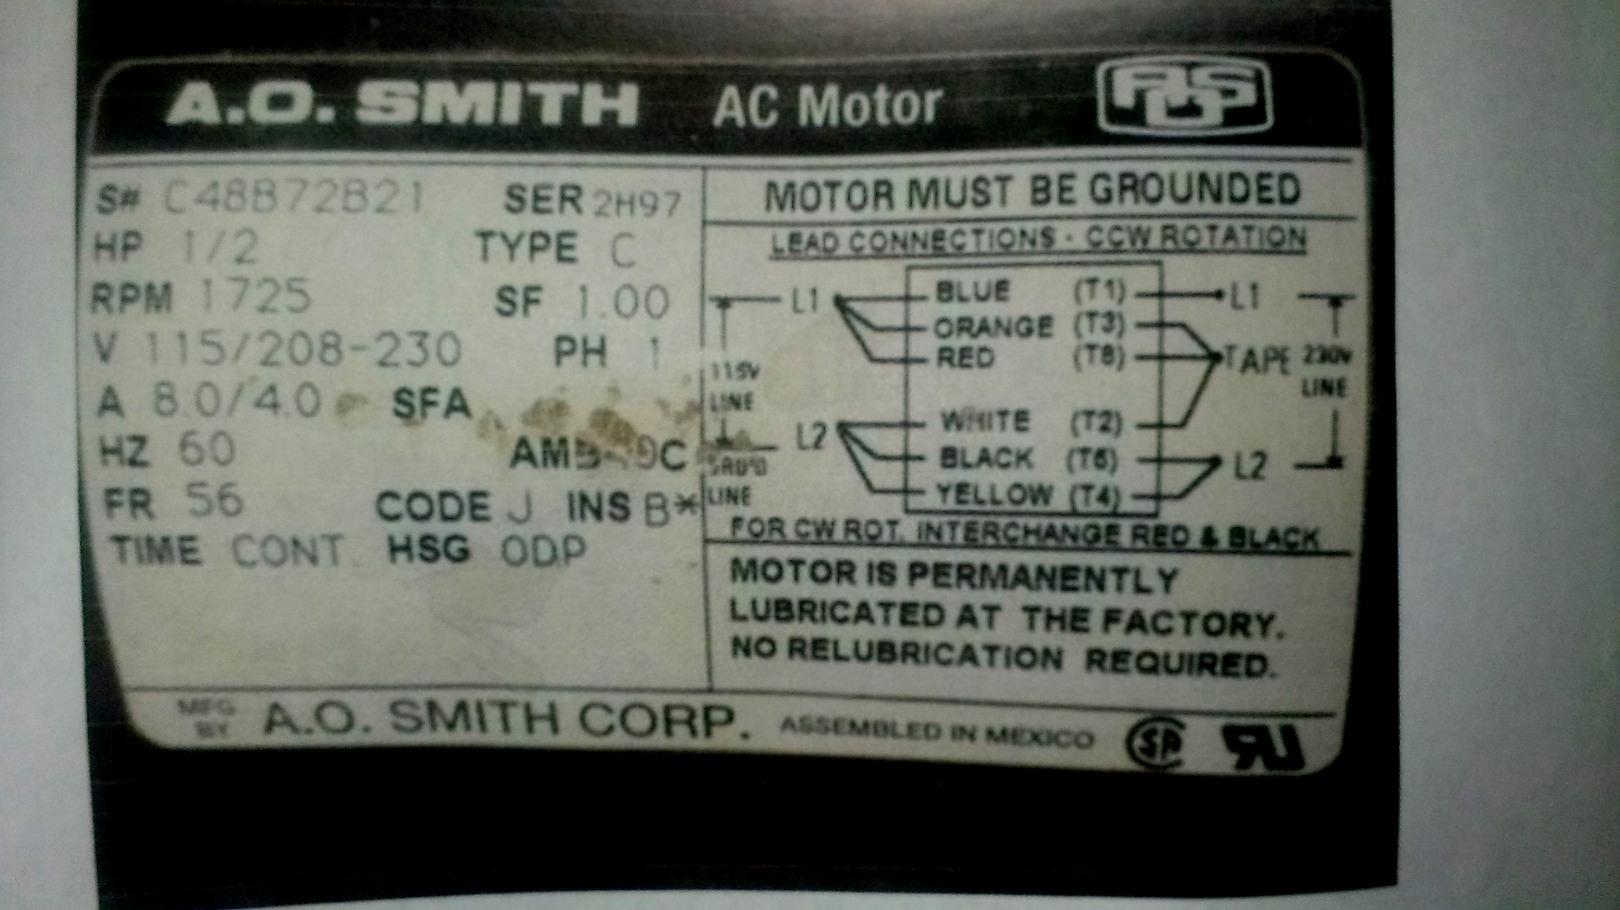 New Ao Smith Motor Wiring Diagram Third Level - Wiringdiagramsdraw - Ao Smith Motor Wiring Diagram